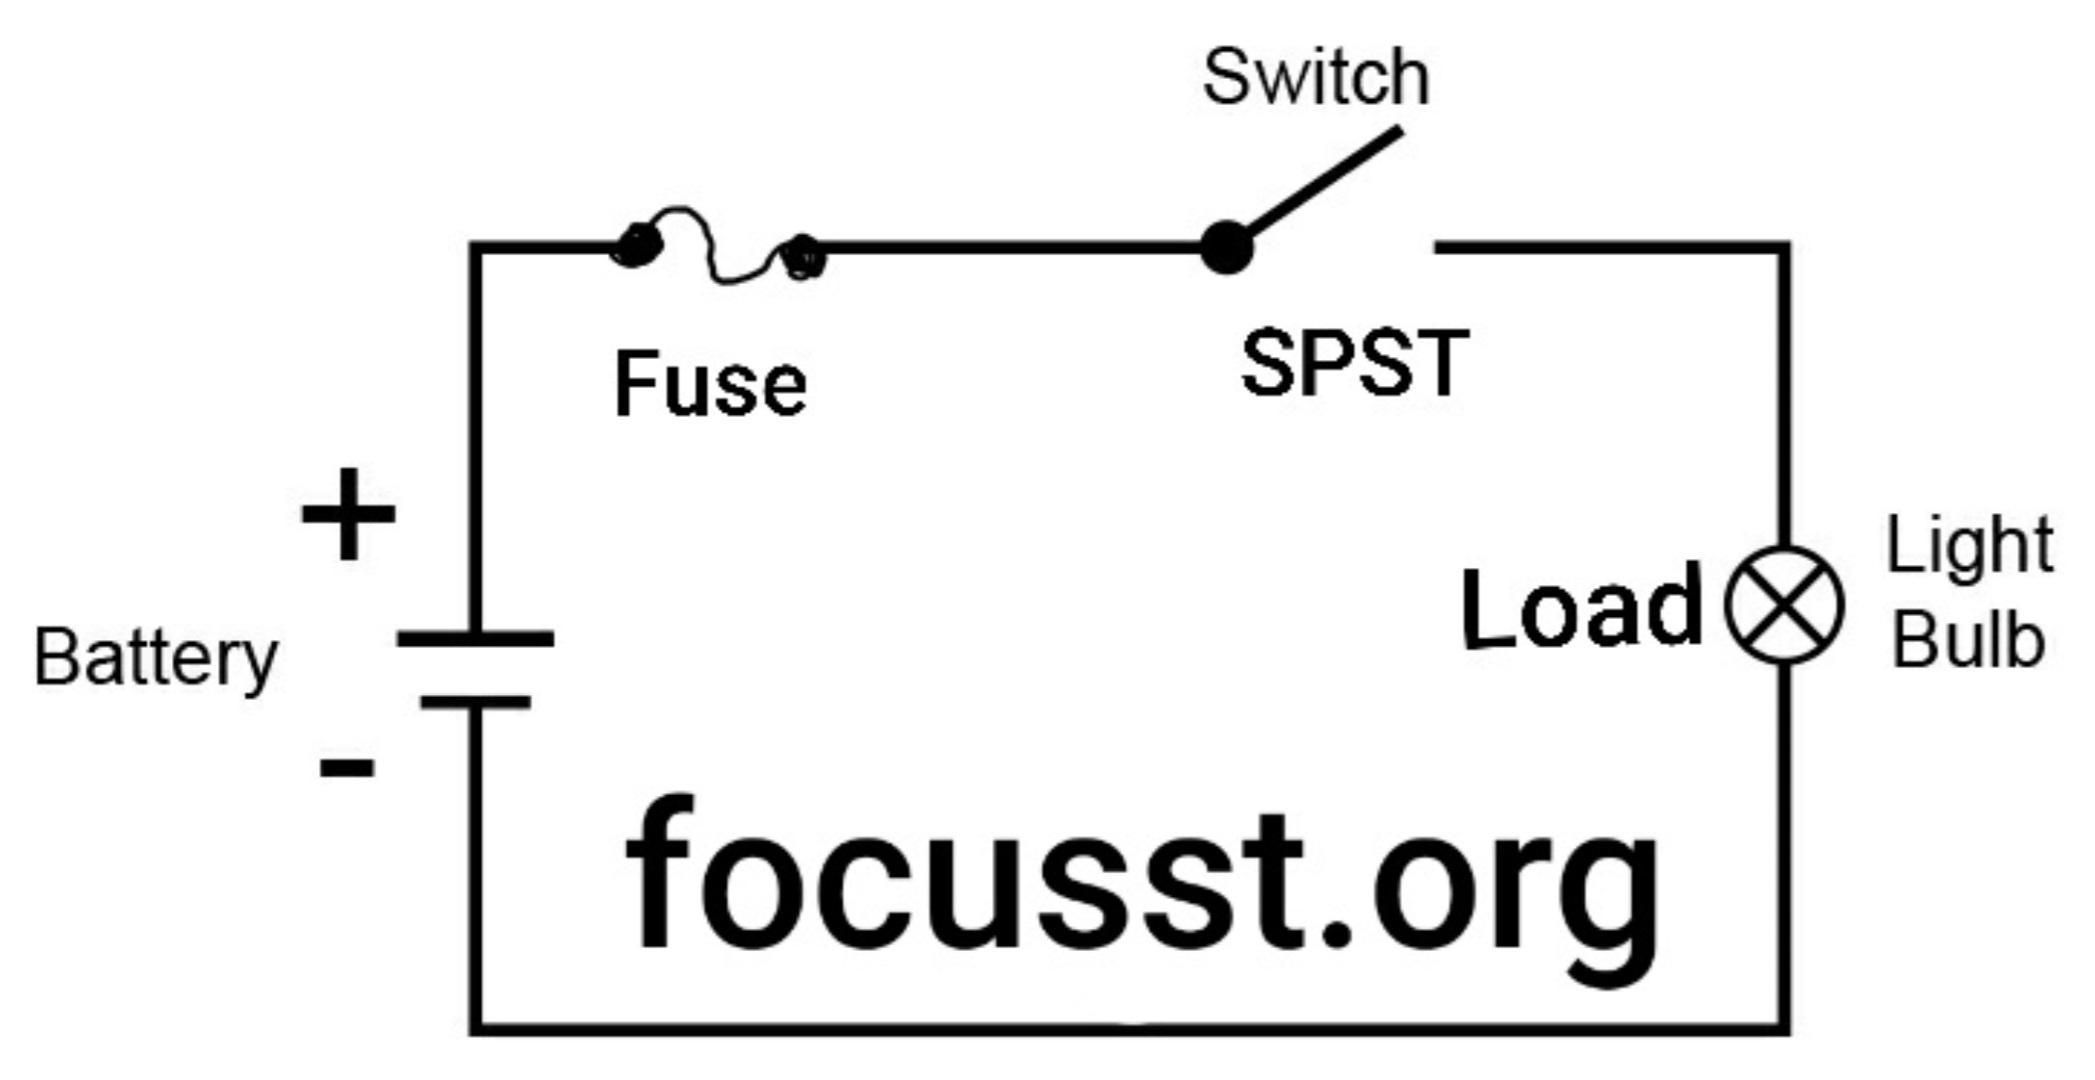 www.focusst.org